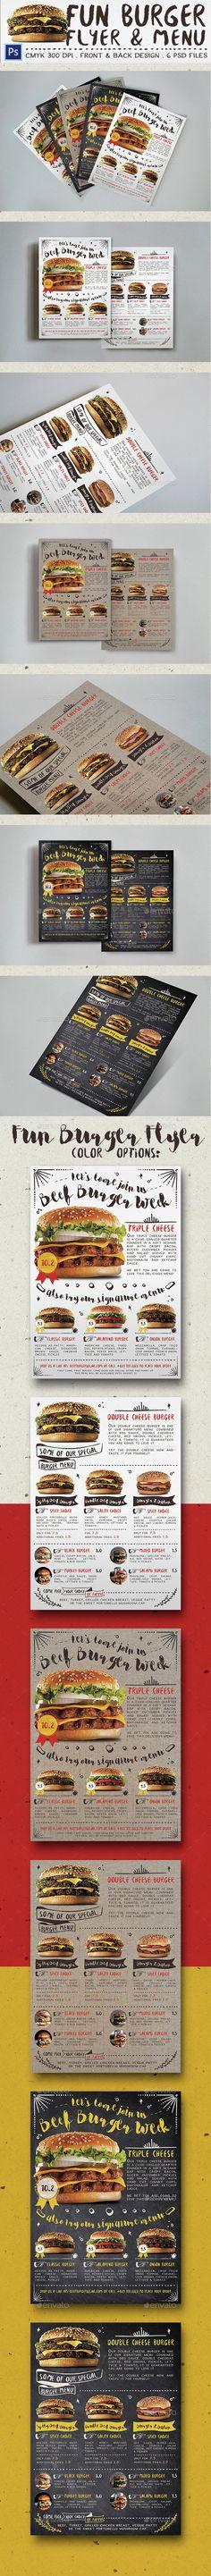 Fun Burger Flyer & Menu Template PSD. Download here: http://graphicriver.net/item/fun-burger-flyer-menu/15169916?ref=ksioks